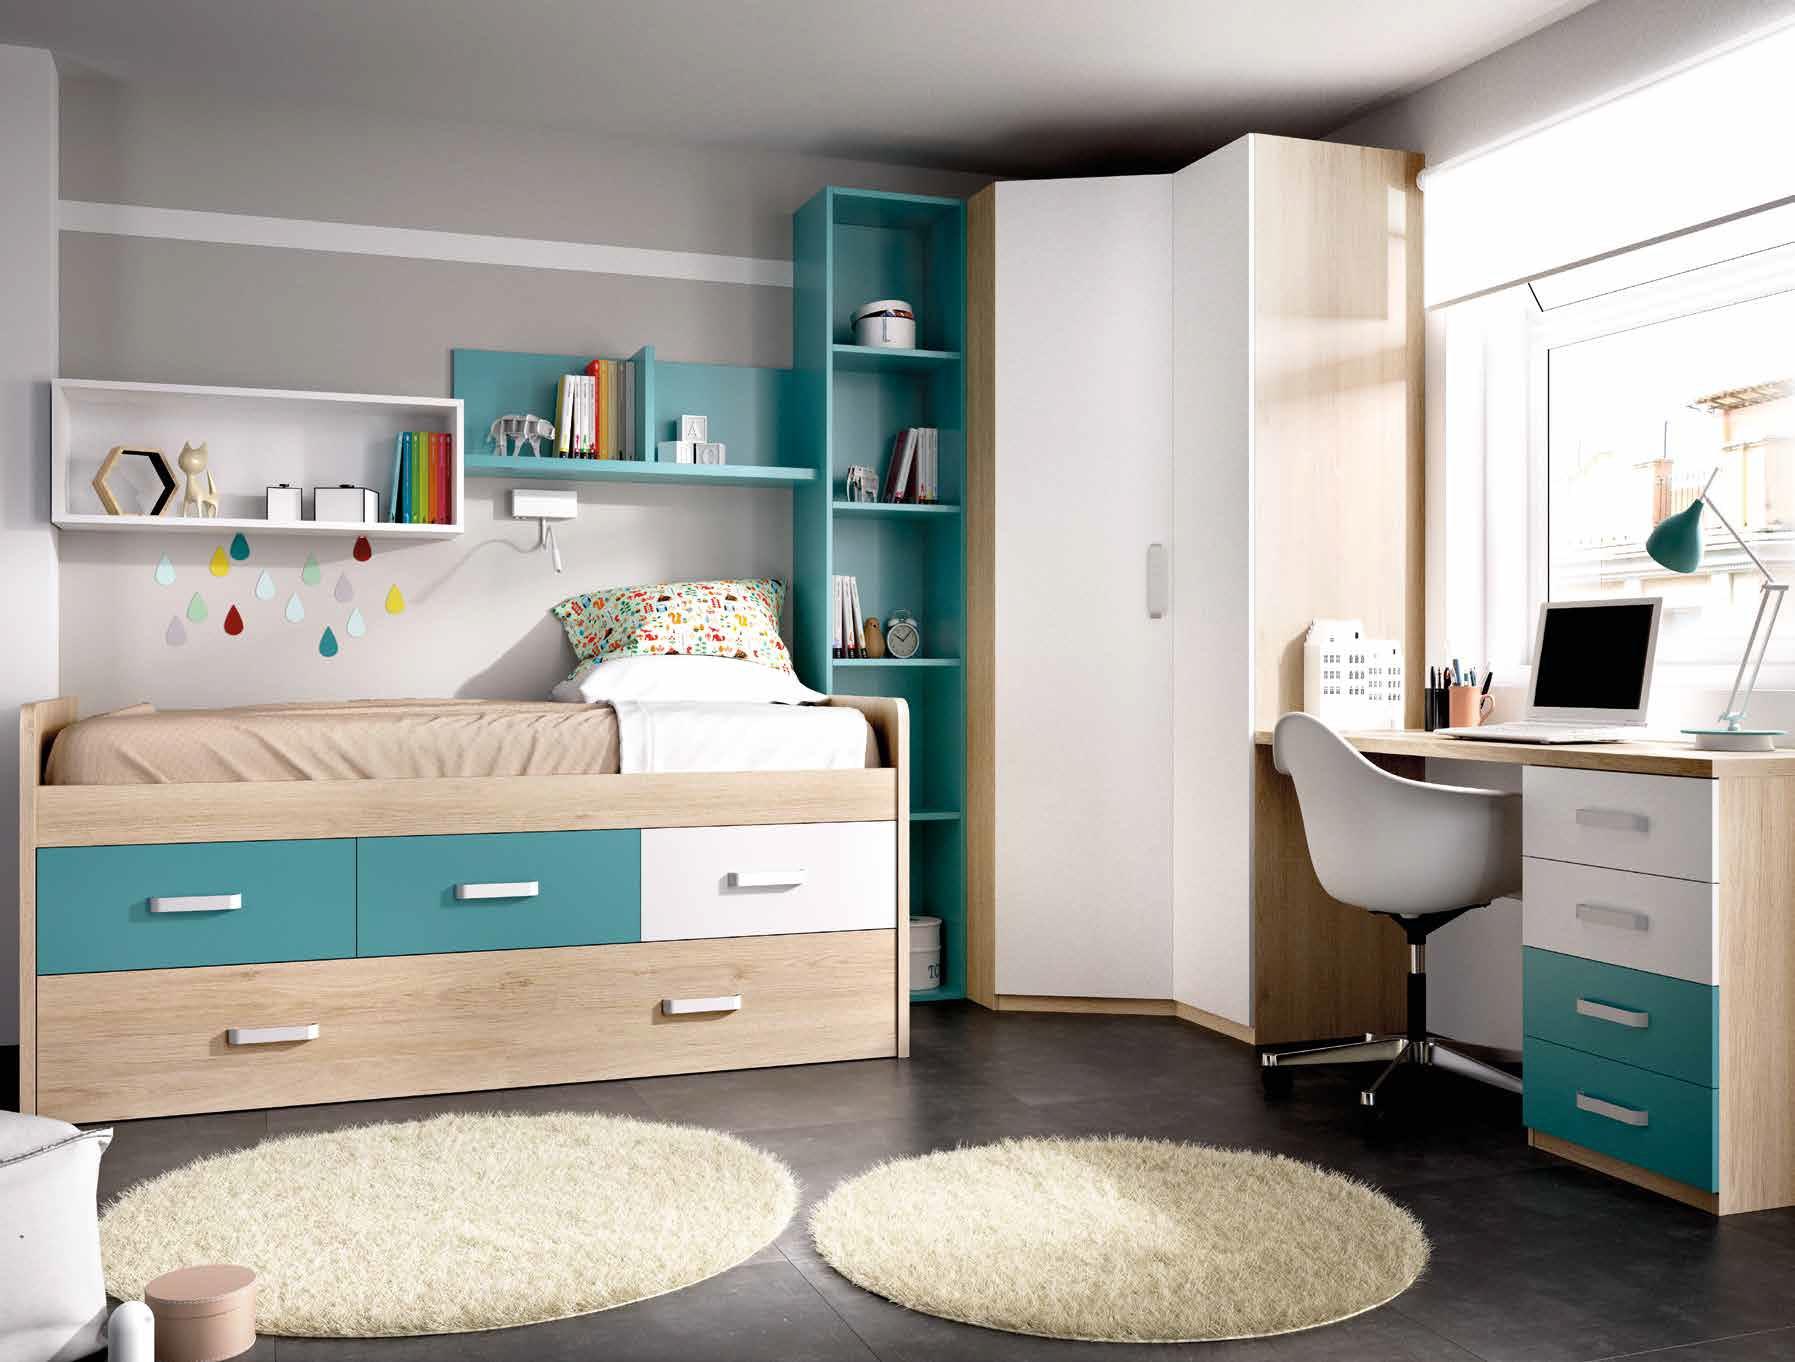 compactos-ONE-19-muebles-paco-caballero-512-5ccc1745b15ab